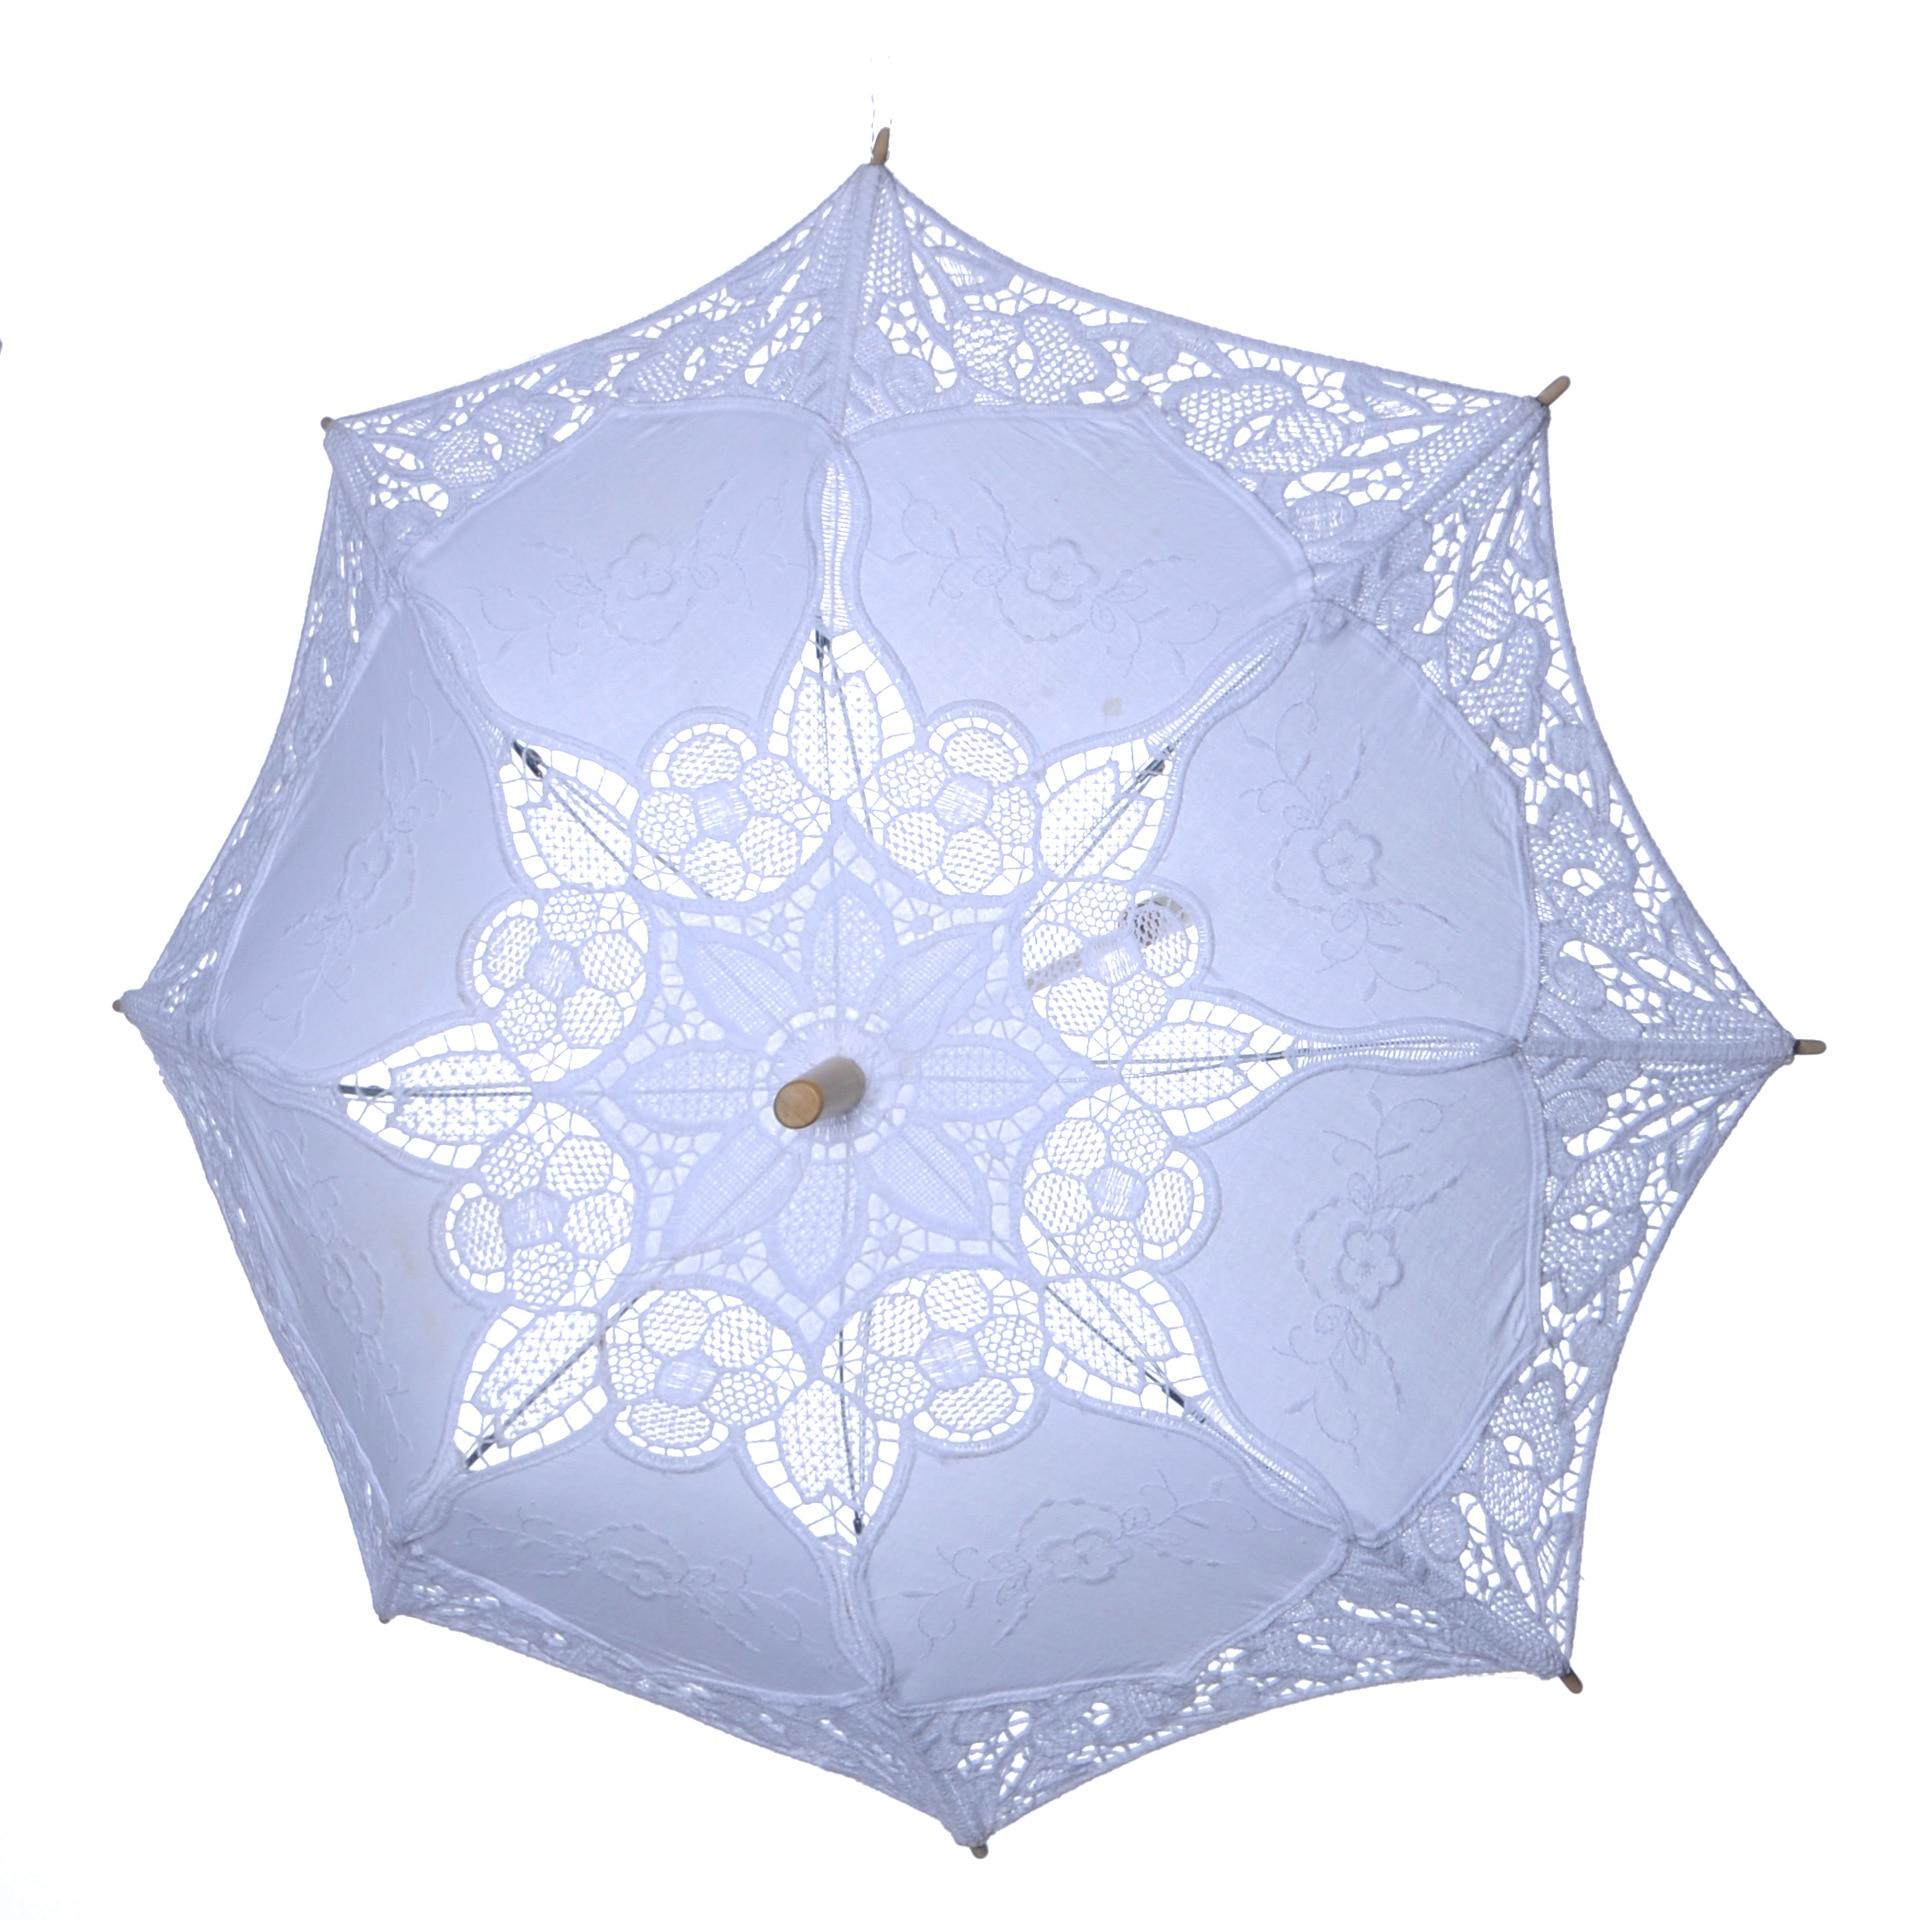 Lace Sunshade Handmade Wedding Umbrellas Retro Lace Umbrella Parasol For Sun For Wedding Photography Wedding Decor BU99036